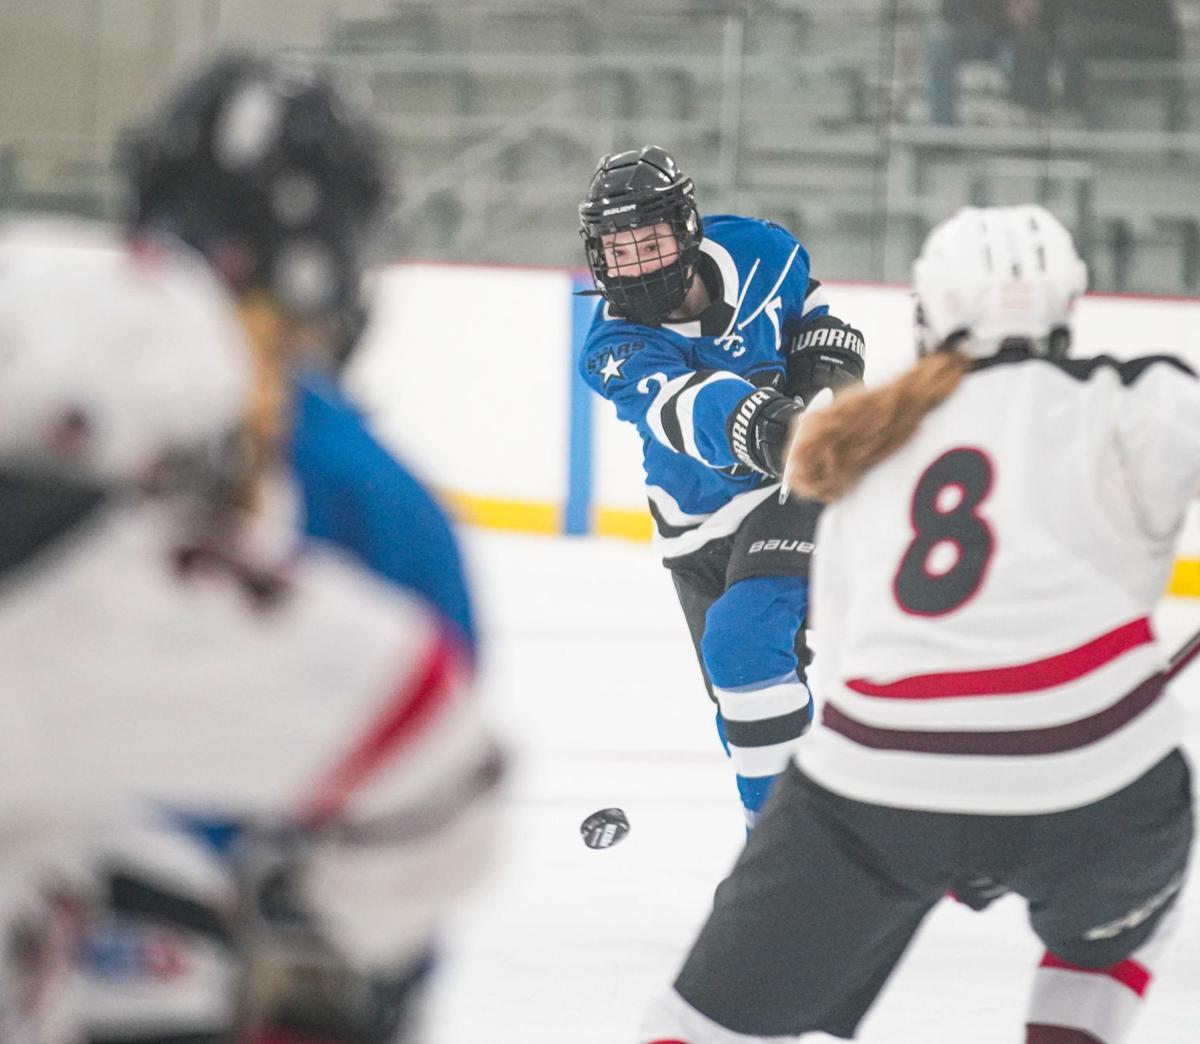 Eau Claire Area Stars vs. Chippewa Falls/Menomonie hockey